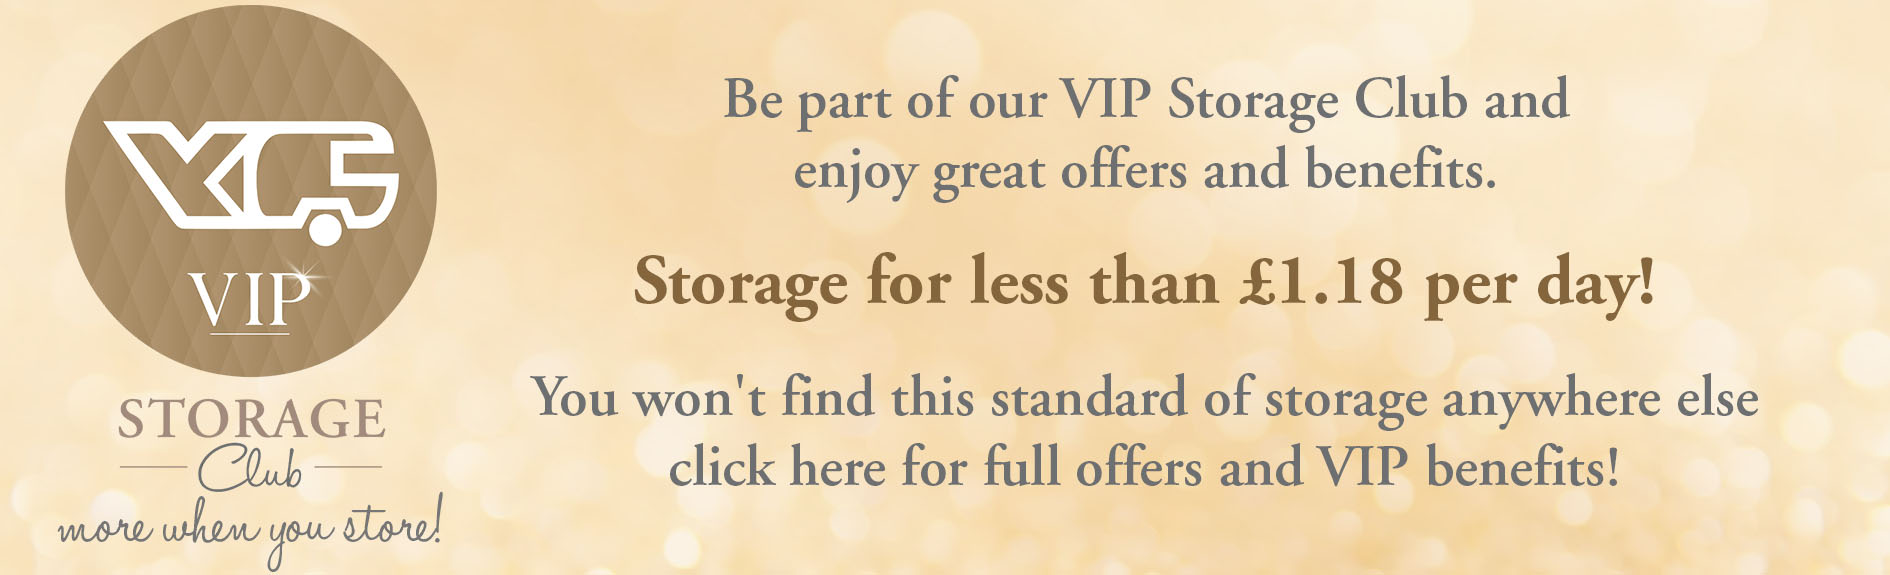 vIP storage club price